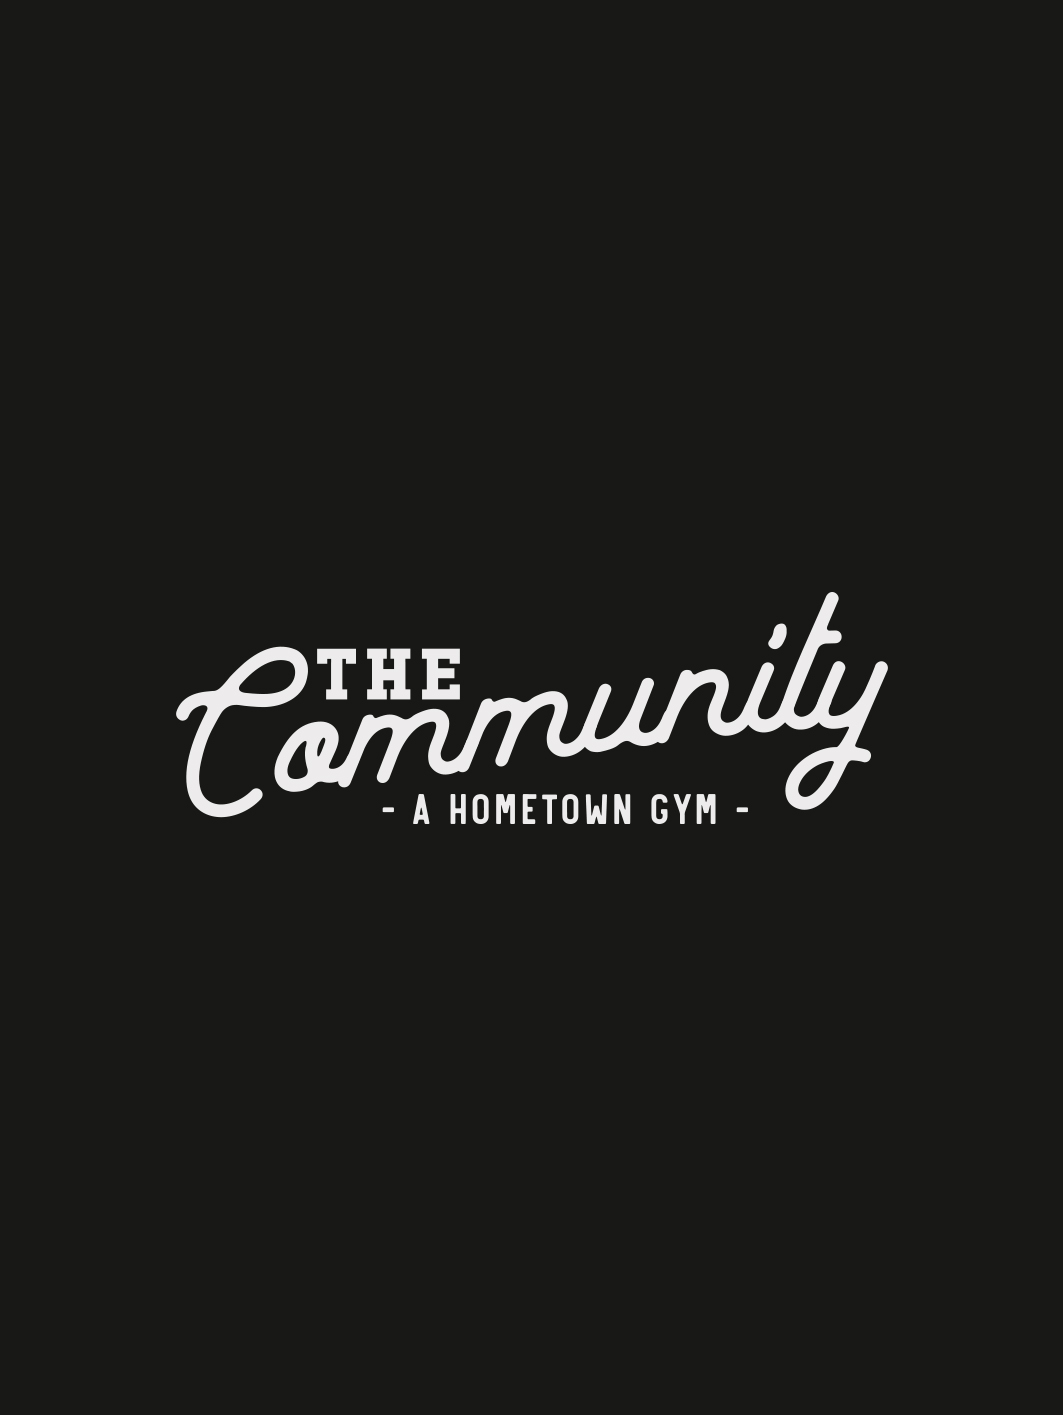 TheCommunity.jpg